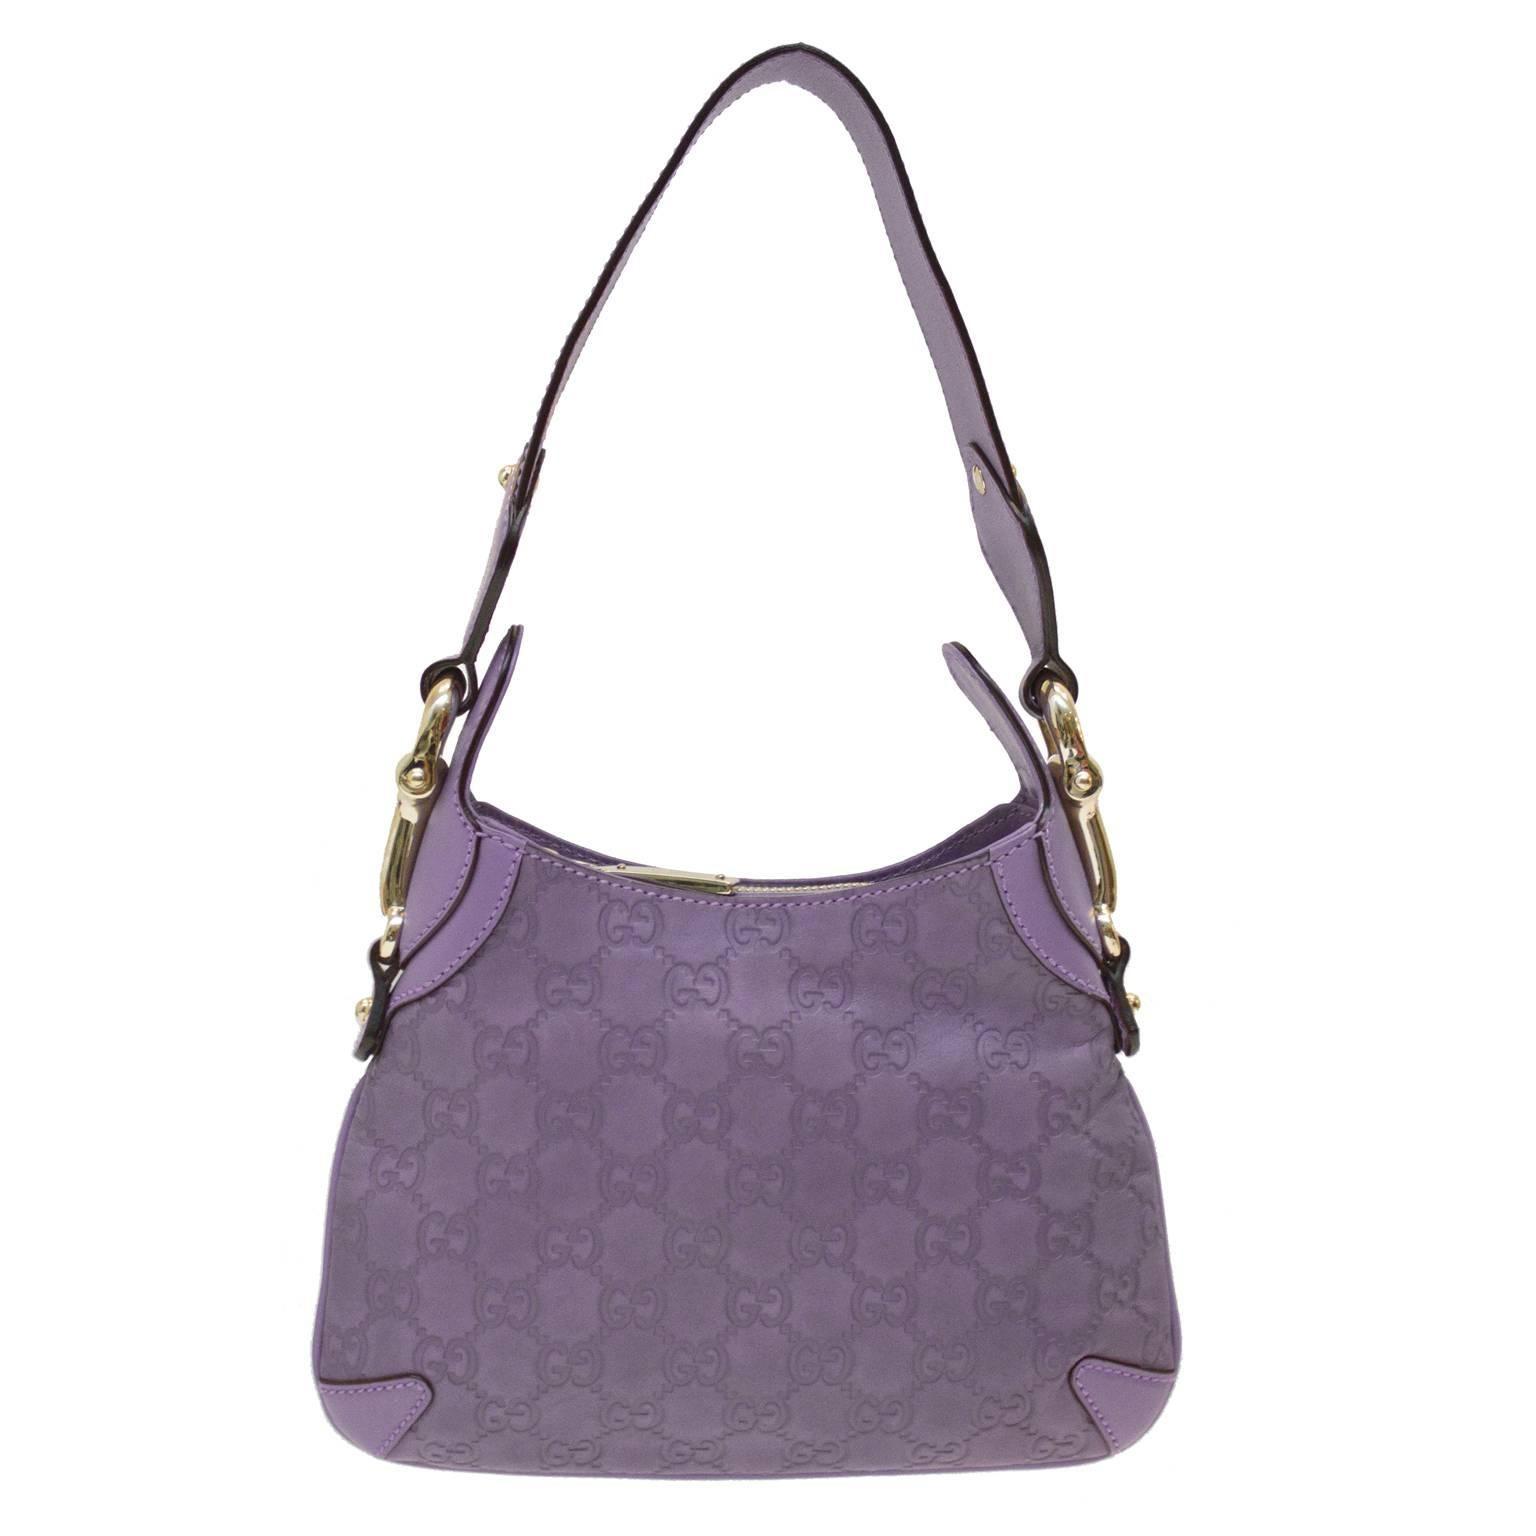 8da3782b006 Gucci Lilac Monogram Leather Mini Bag at 1stdibs